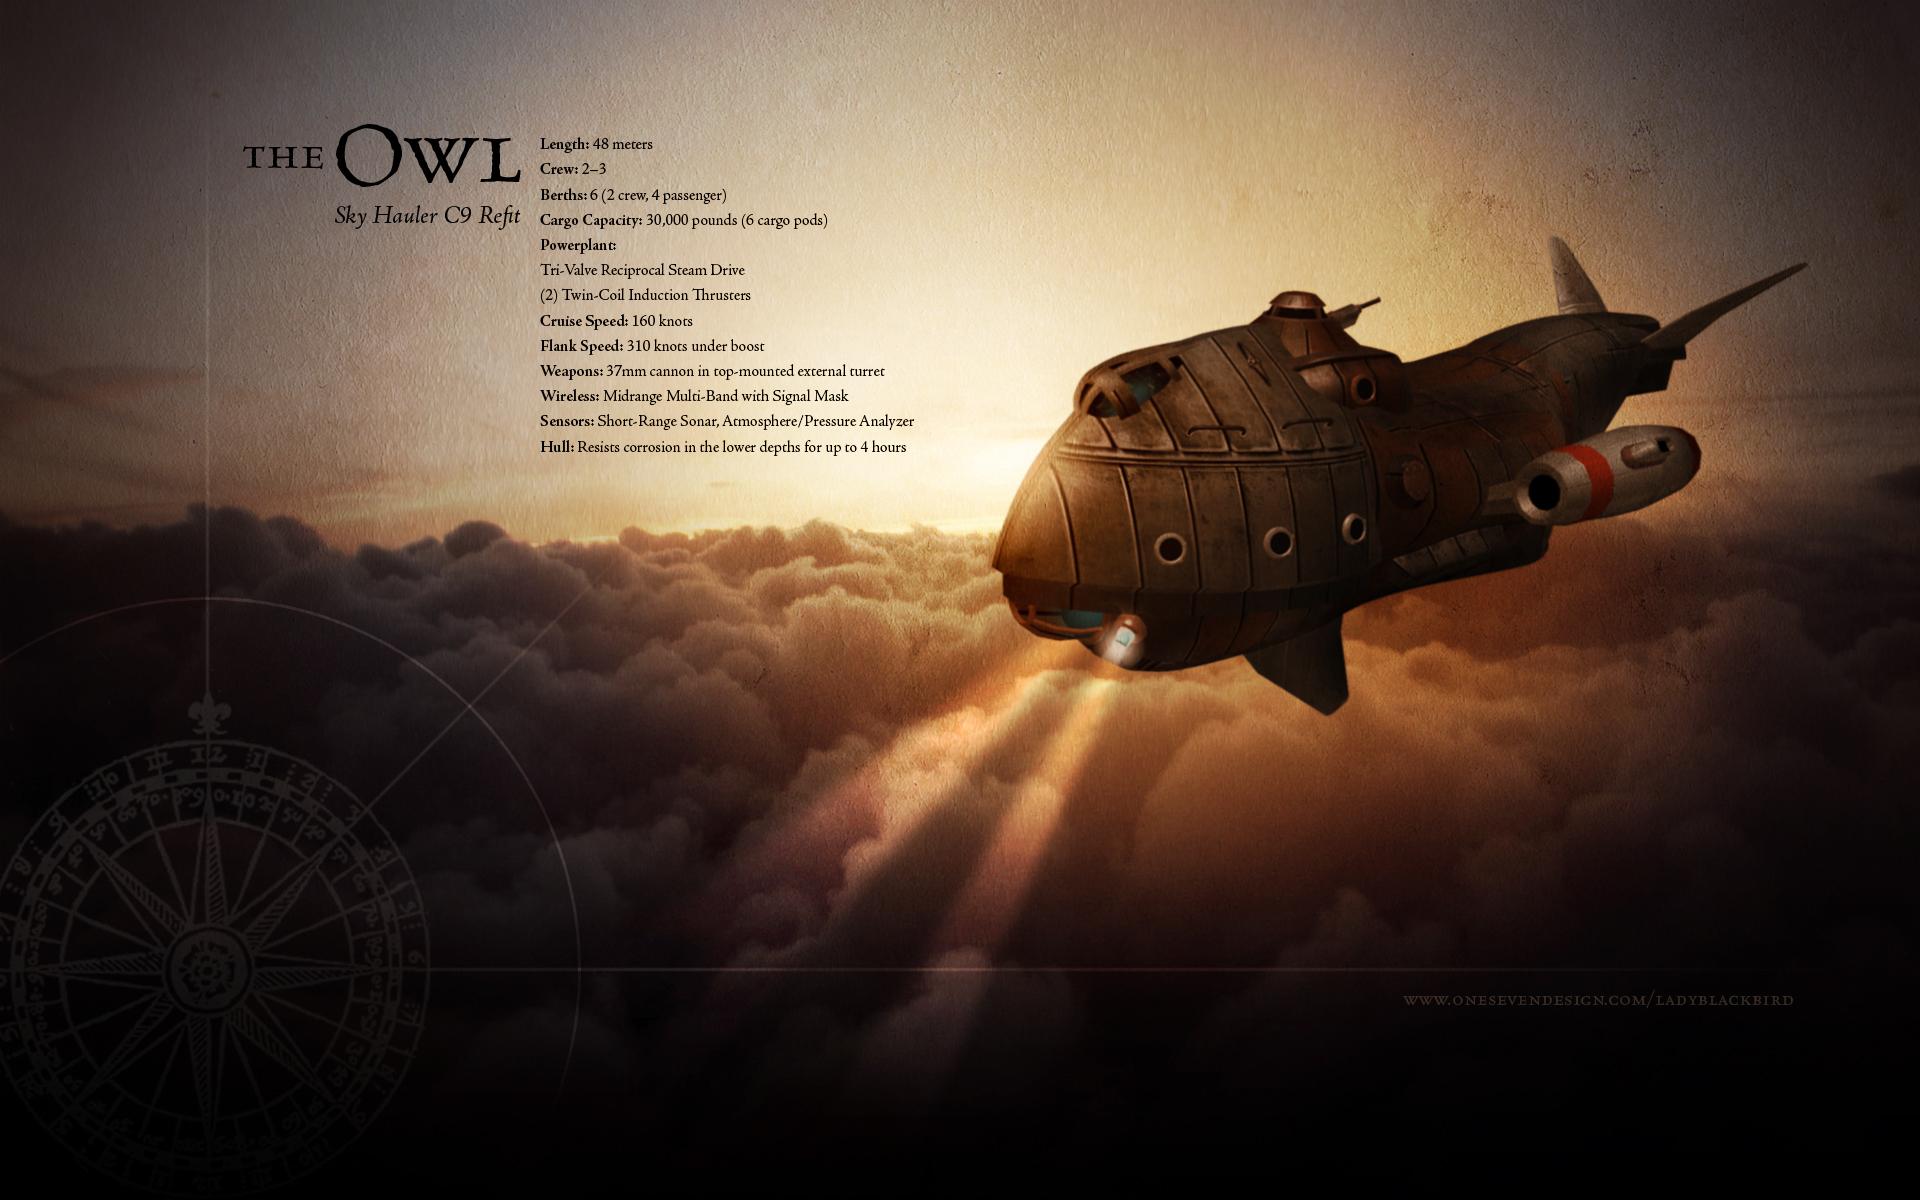 the_owl_sunset_1920x1200.jpg